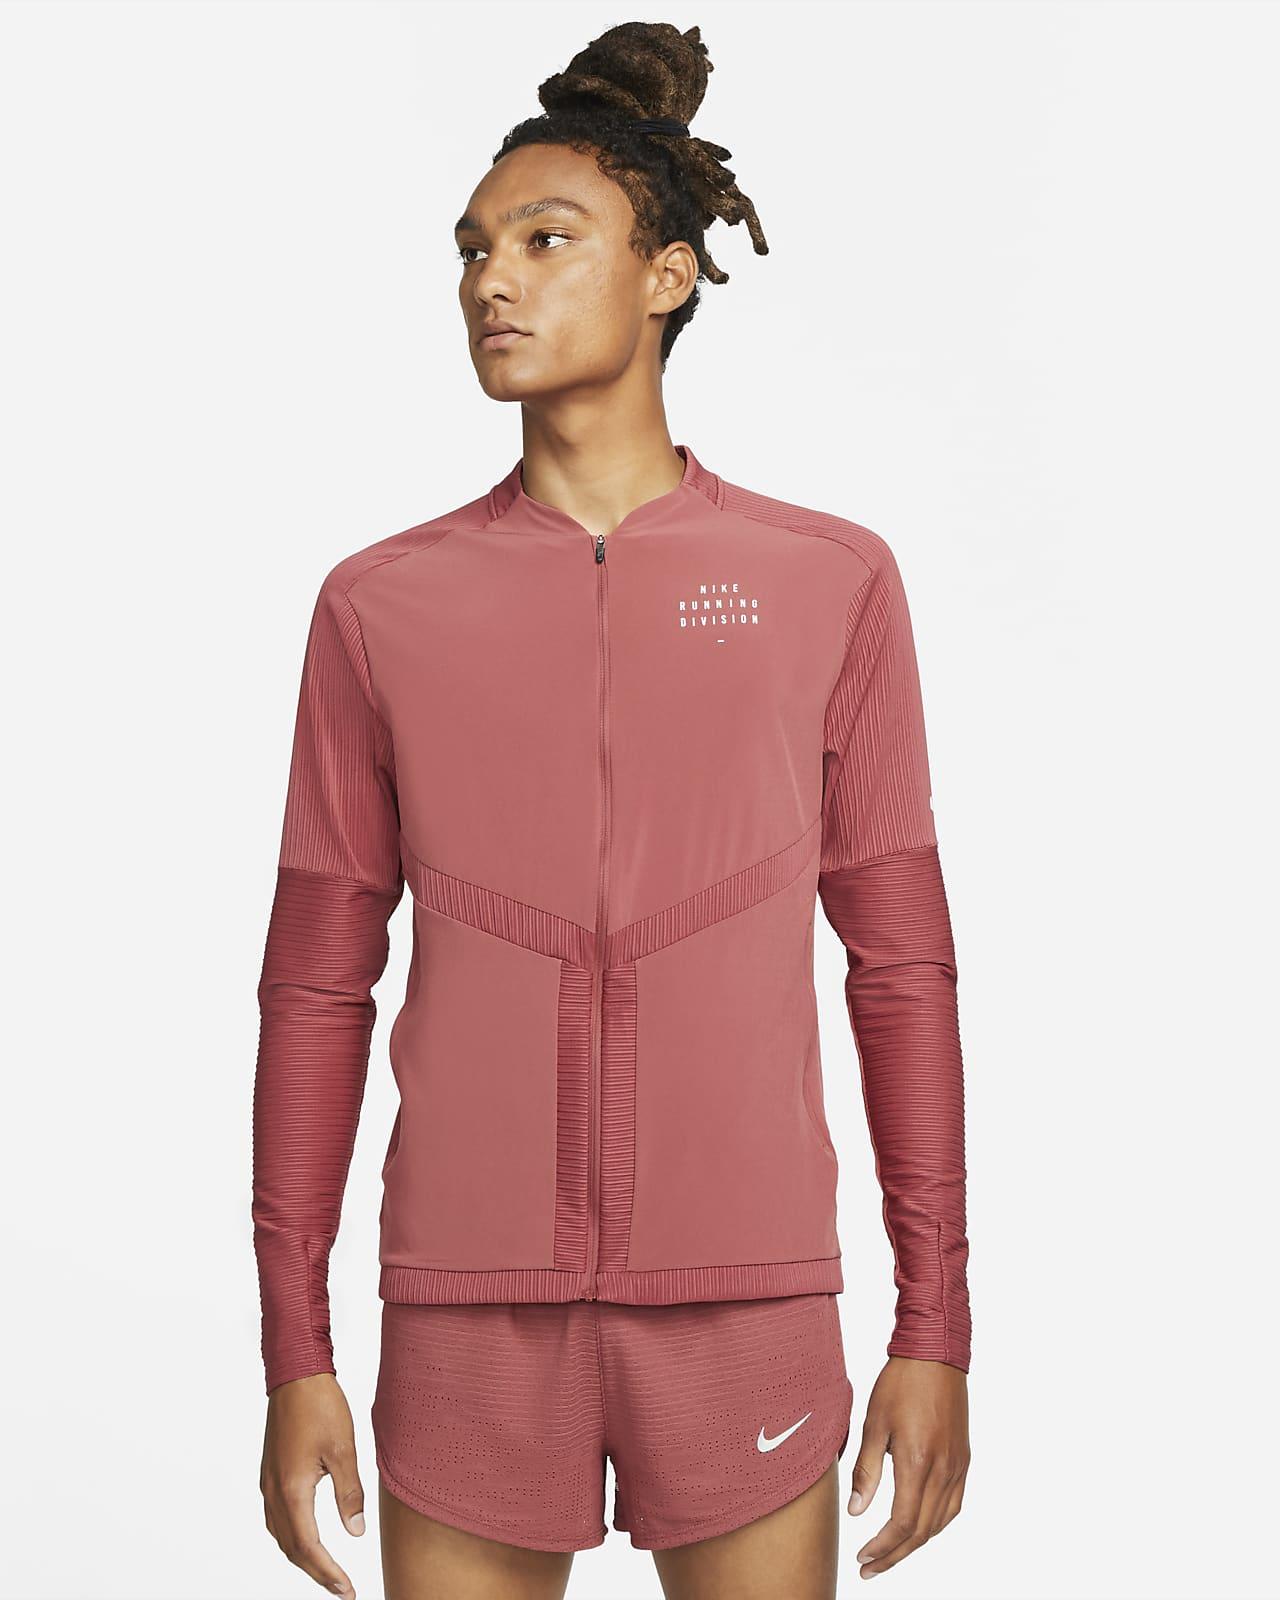 Camiseta de running de cierre completo para hombre Nike Dri-FIT Element Run Division